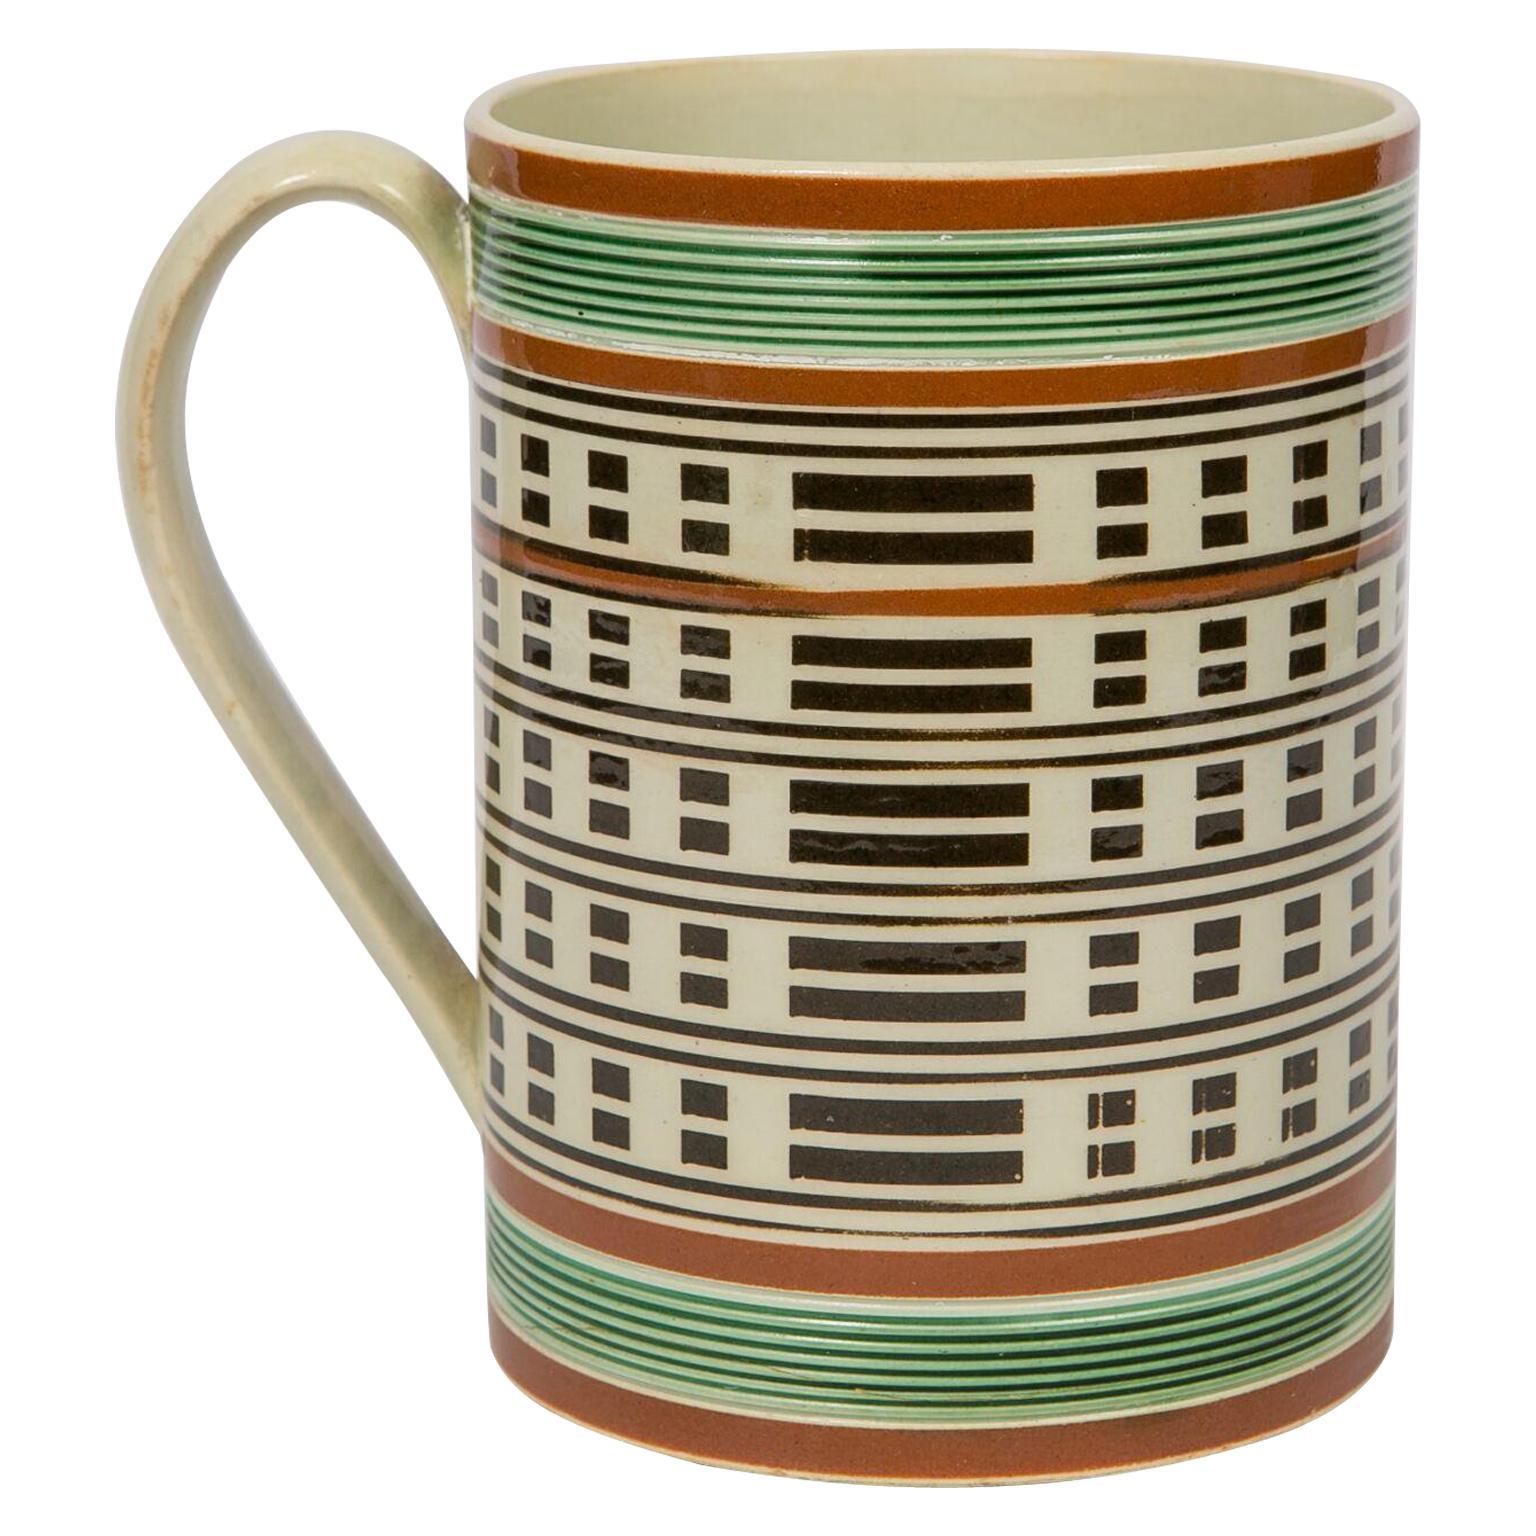 Antique Mochaware Mug Slip Decorated Made in England, circa 1815